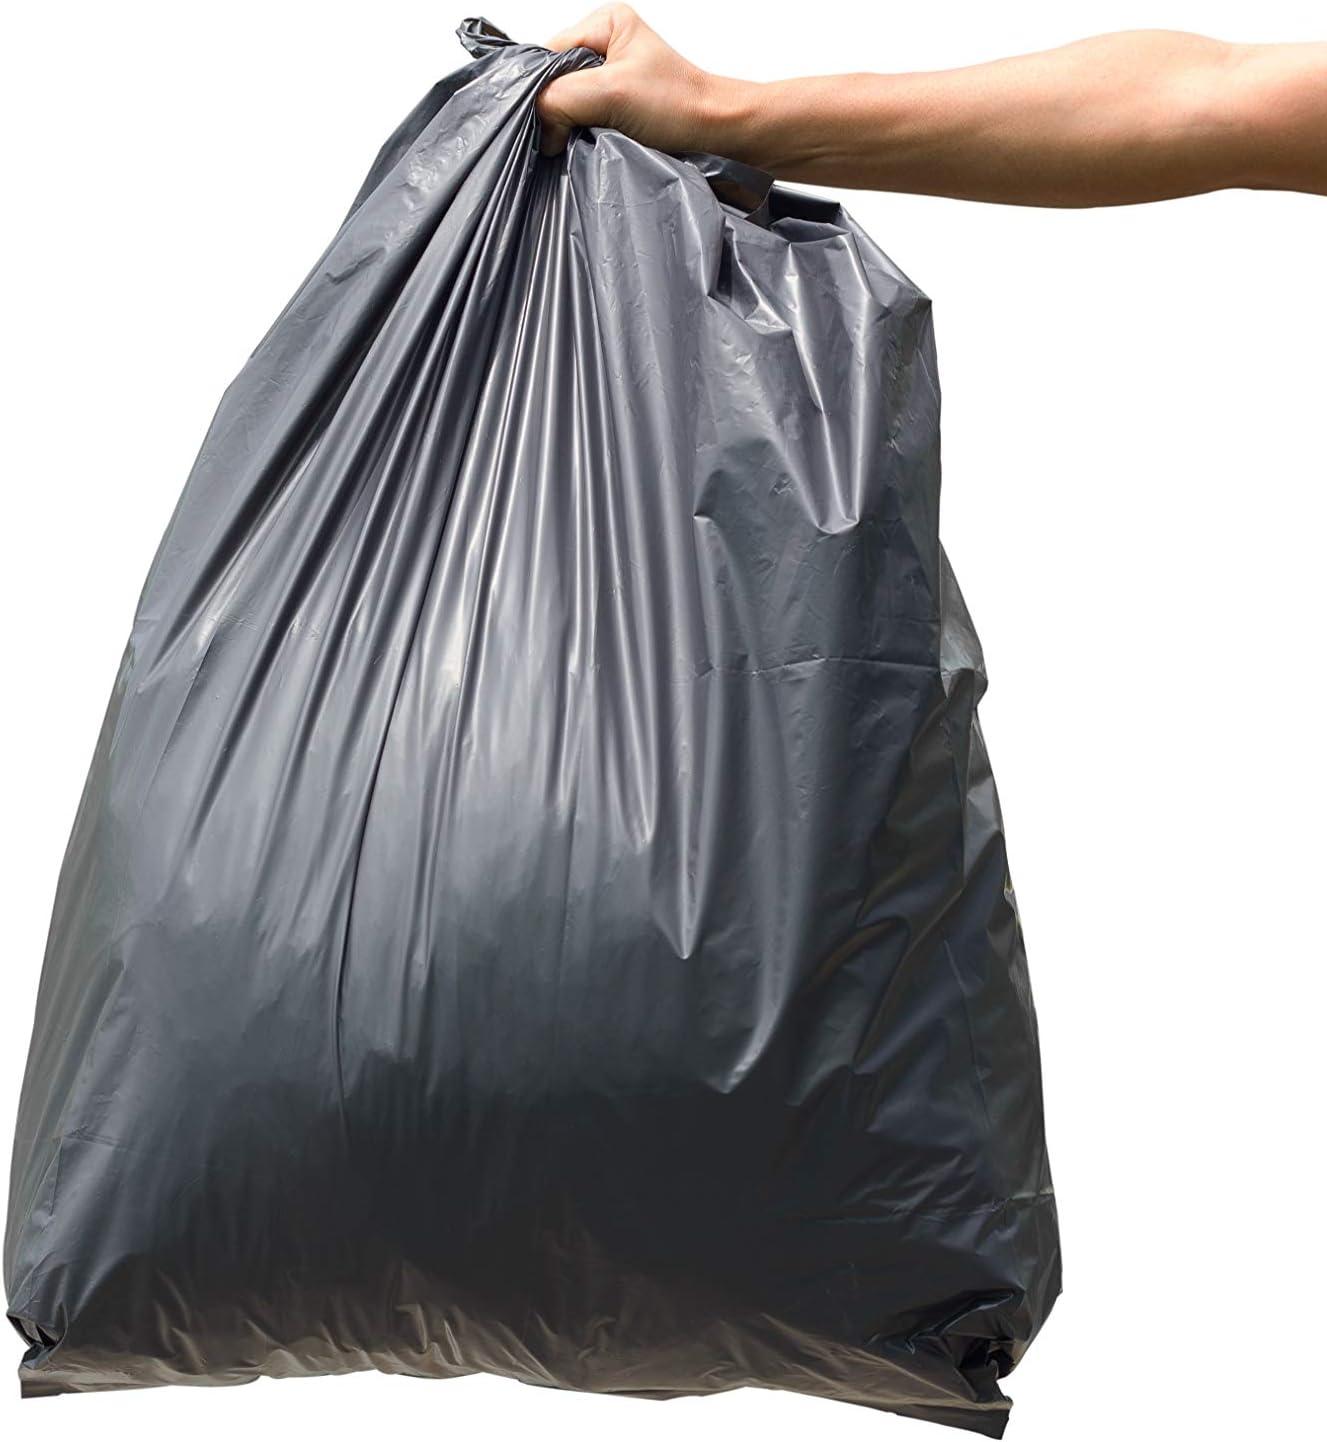 50 Gal 150 Count 55 Gallon Trash Bags Heavy Duty 55 Gallon Trash Bags with Handles Reli 50 Gallon - Black 55 Gallon Drum Liners 60 Gallon 55 Gal